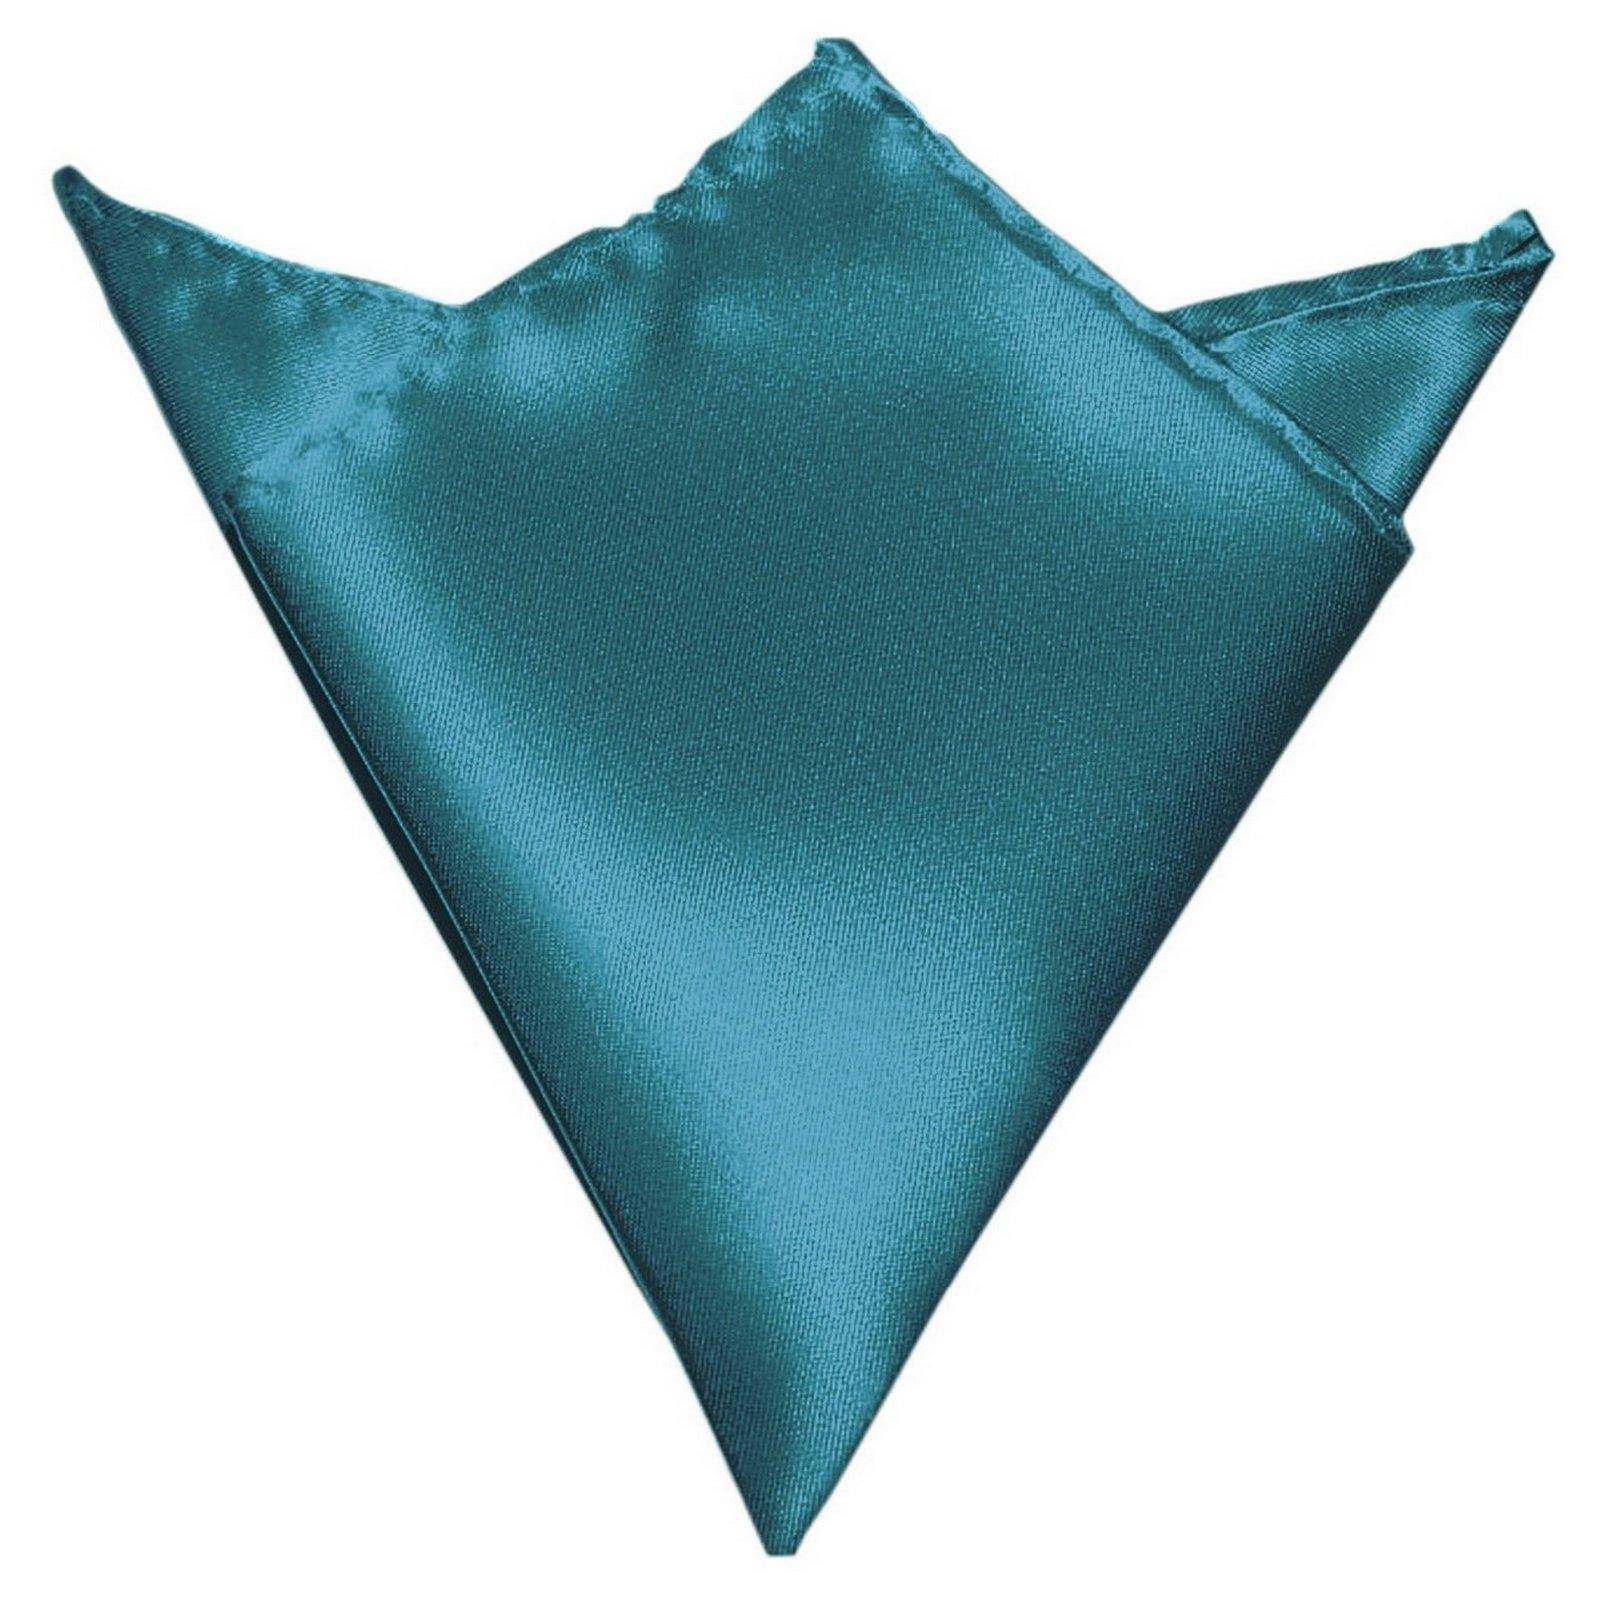 GASSANI Teal Blue Green Hanky Pocket Square Handkerchief Pocket Hanky by GASSANI